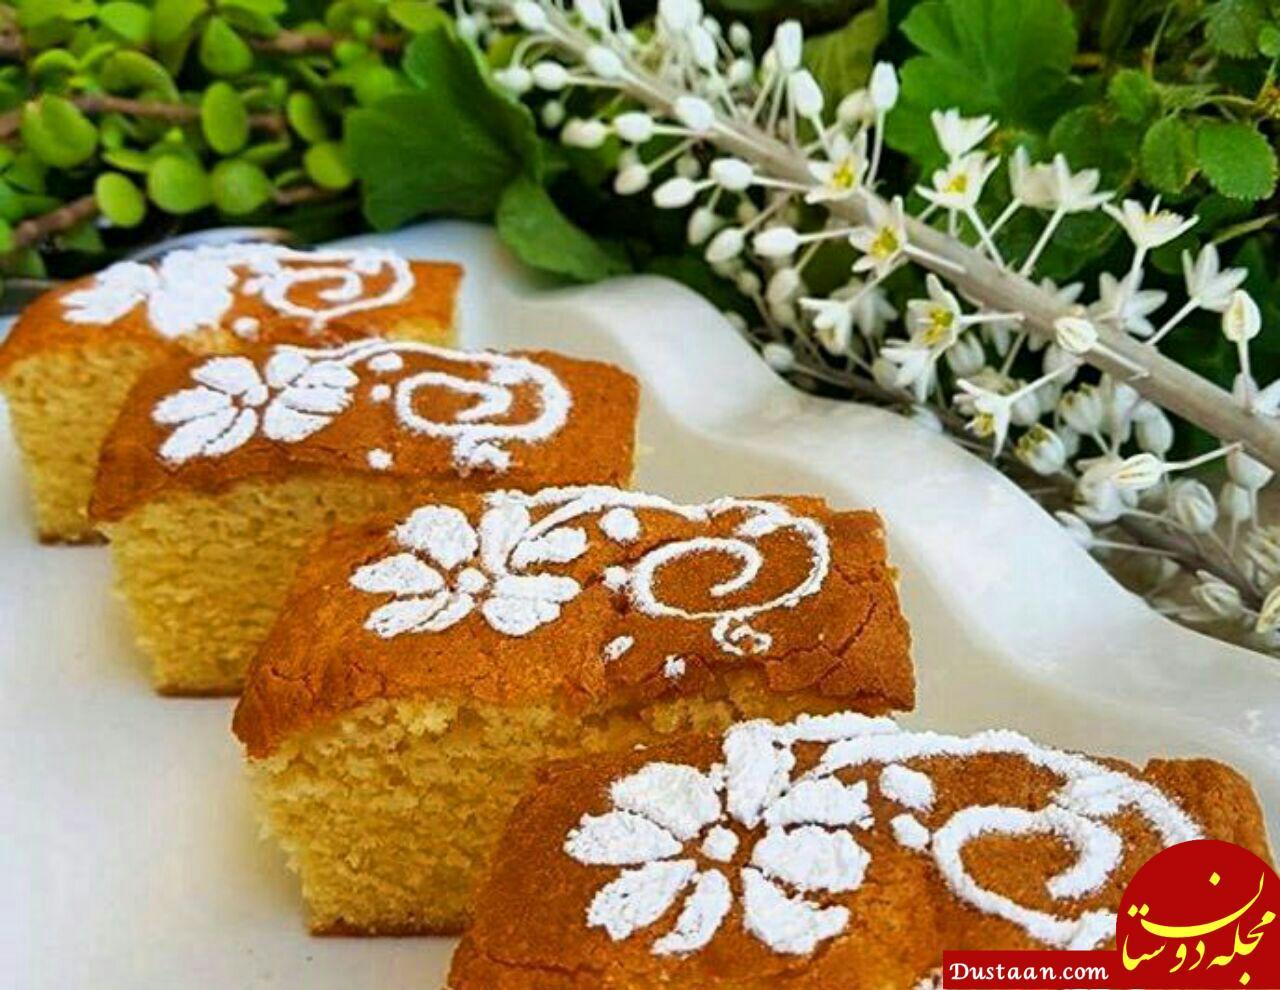 www.dustaan.com طرز تهیه کیک پنیری به سبکی خوشمزه و متفاوت